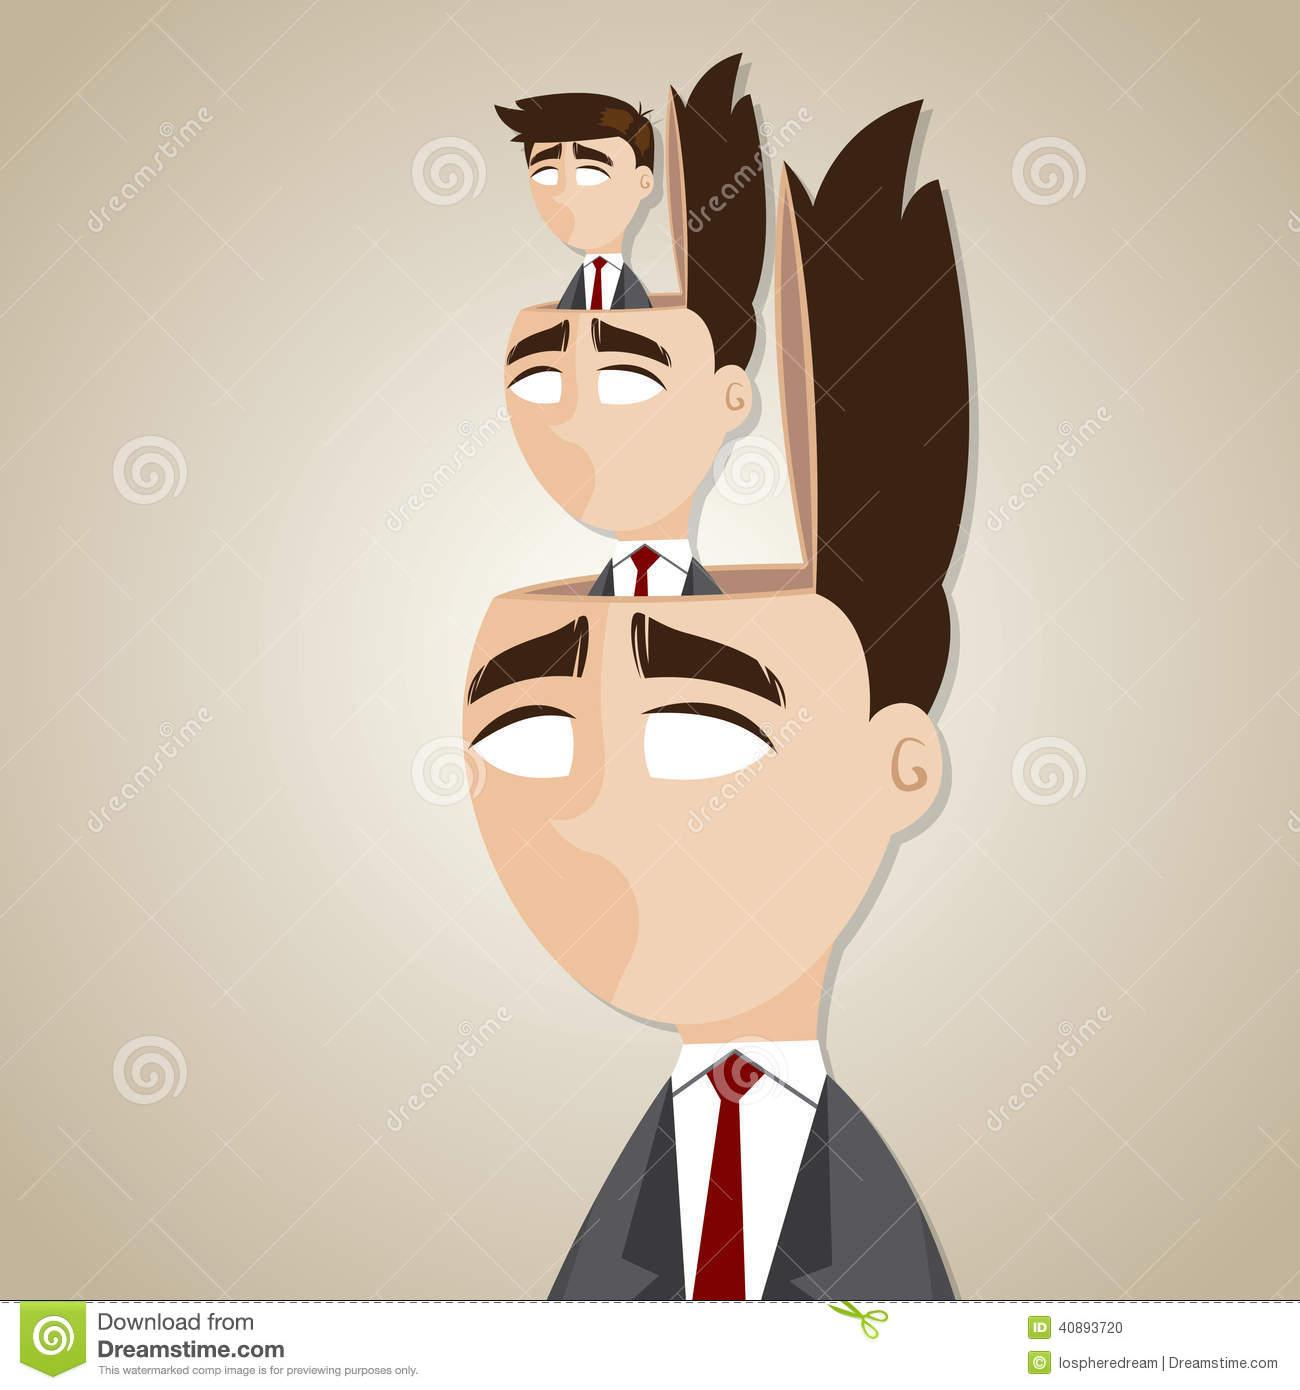 Cartoon Duplicate Businessman In His Head Stock Vector.